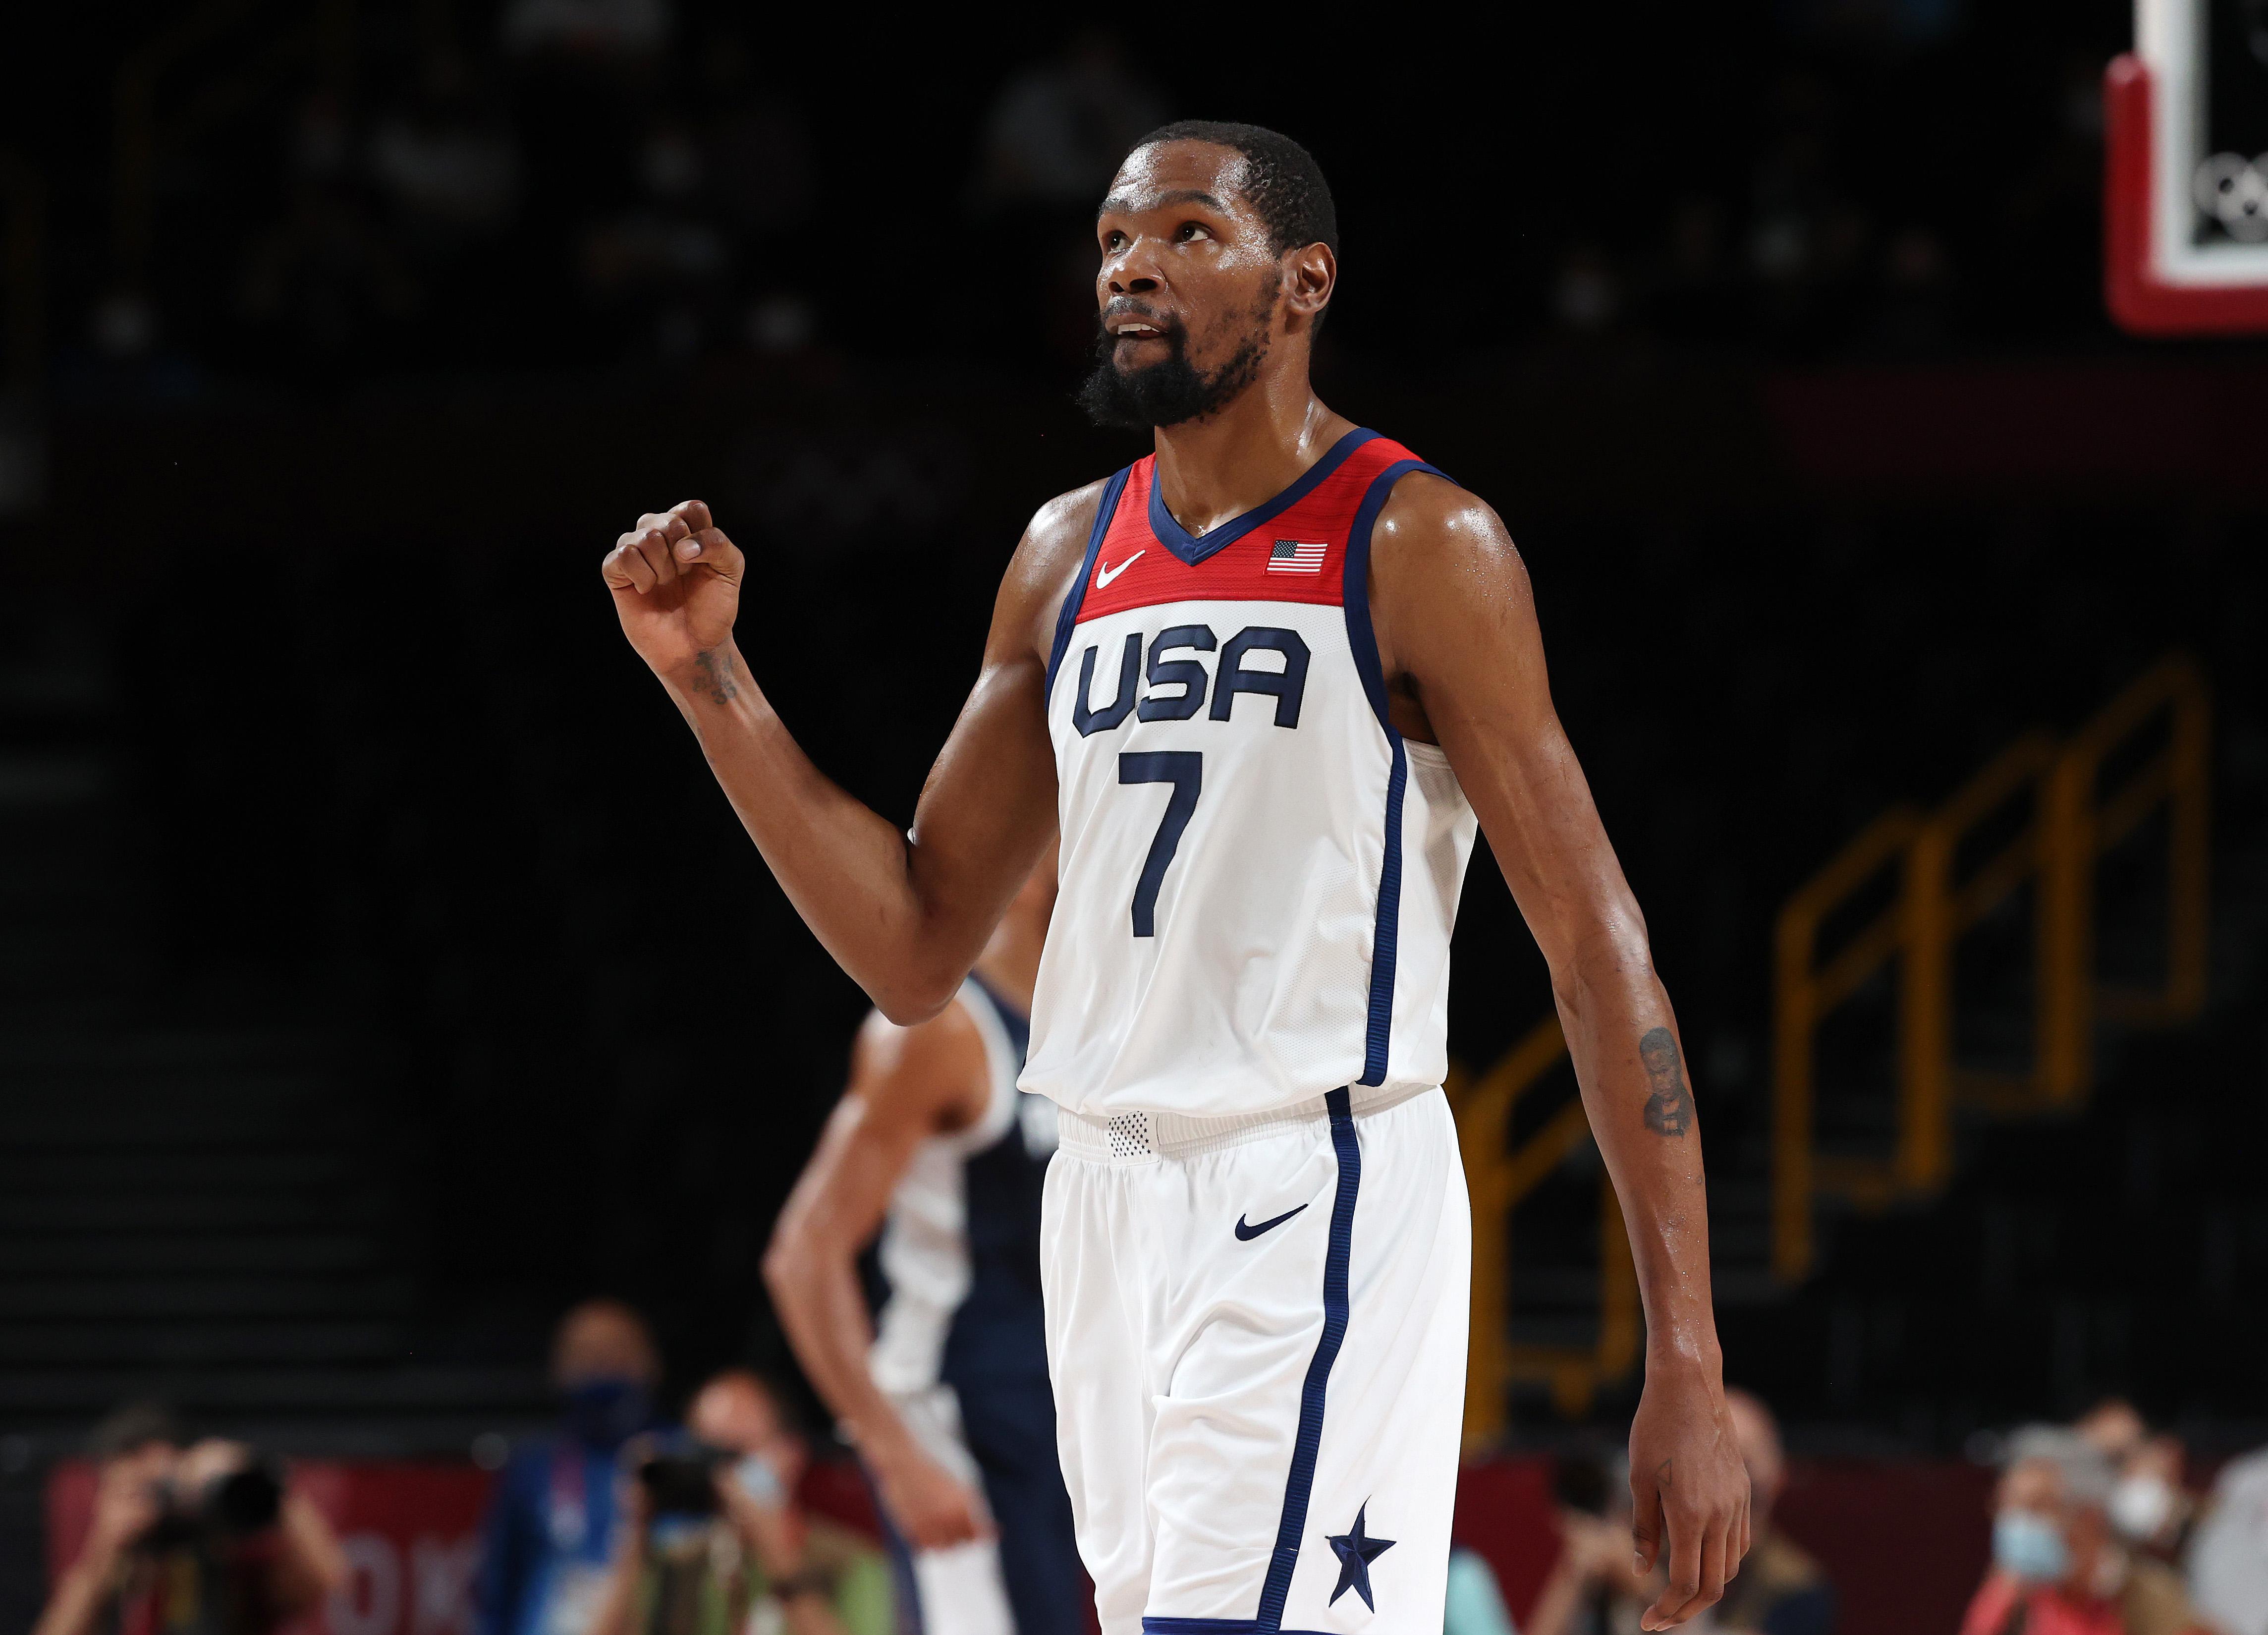 United States v France Men's Basketball - Olympics: Day 15